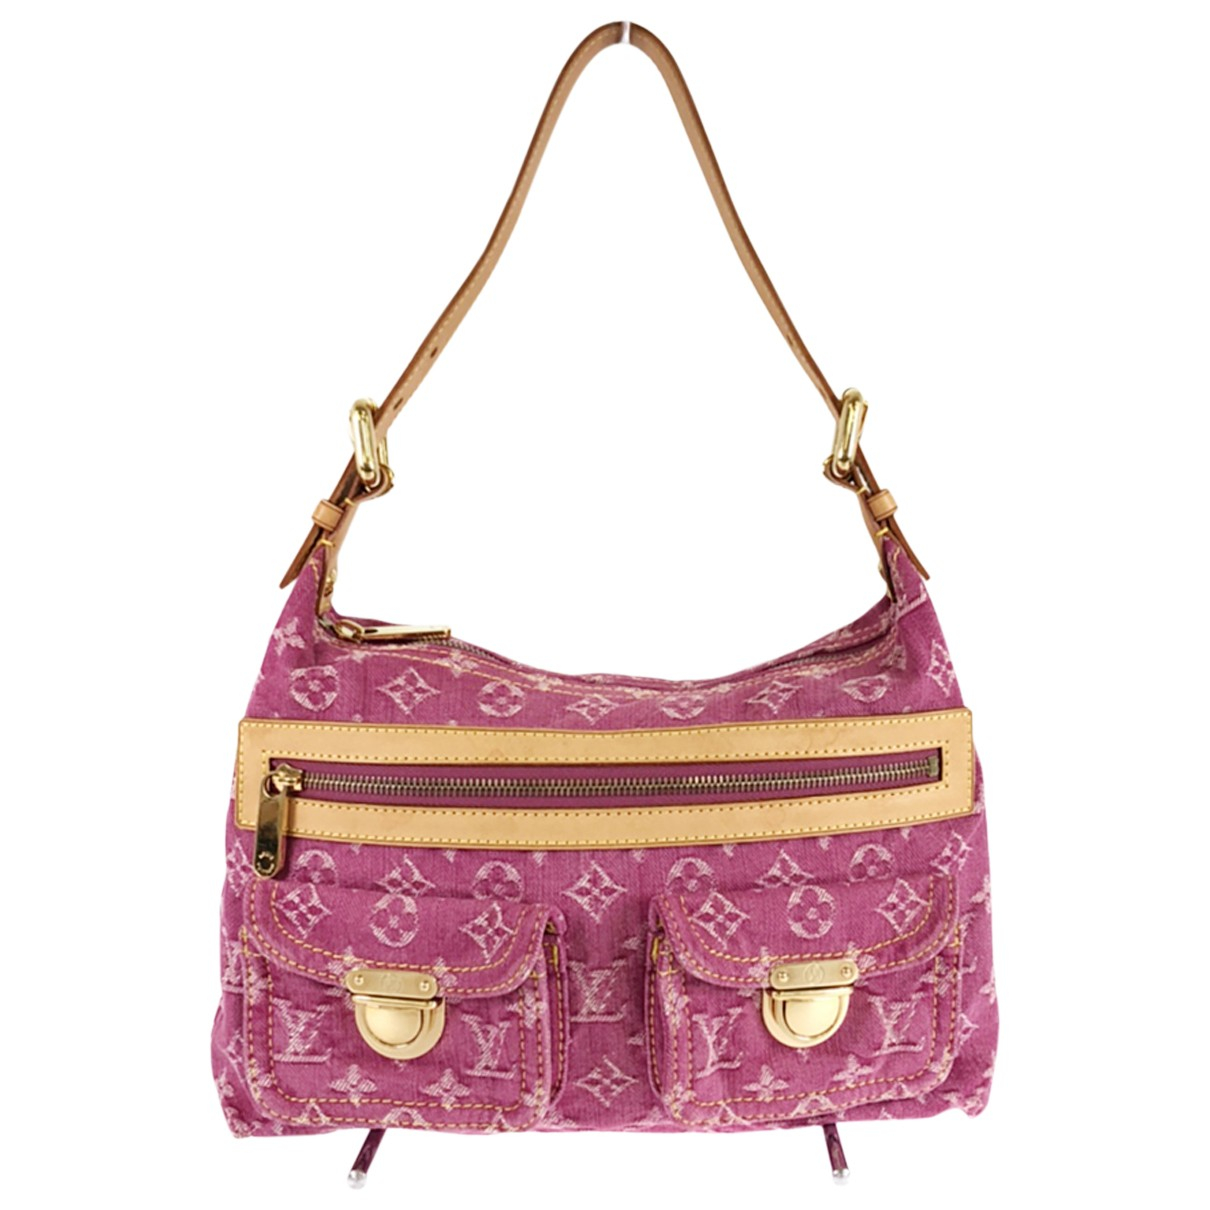 Louis Vuitton Baggy Pink Denim - Jeans handbag for Women N